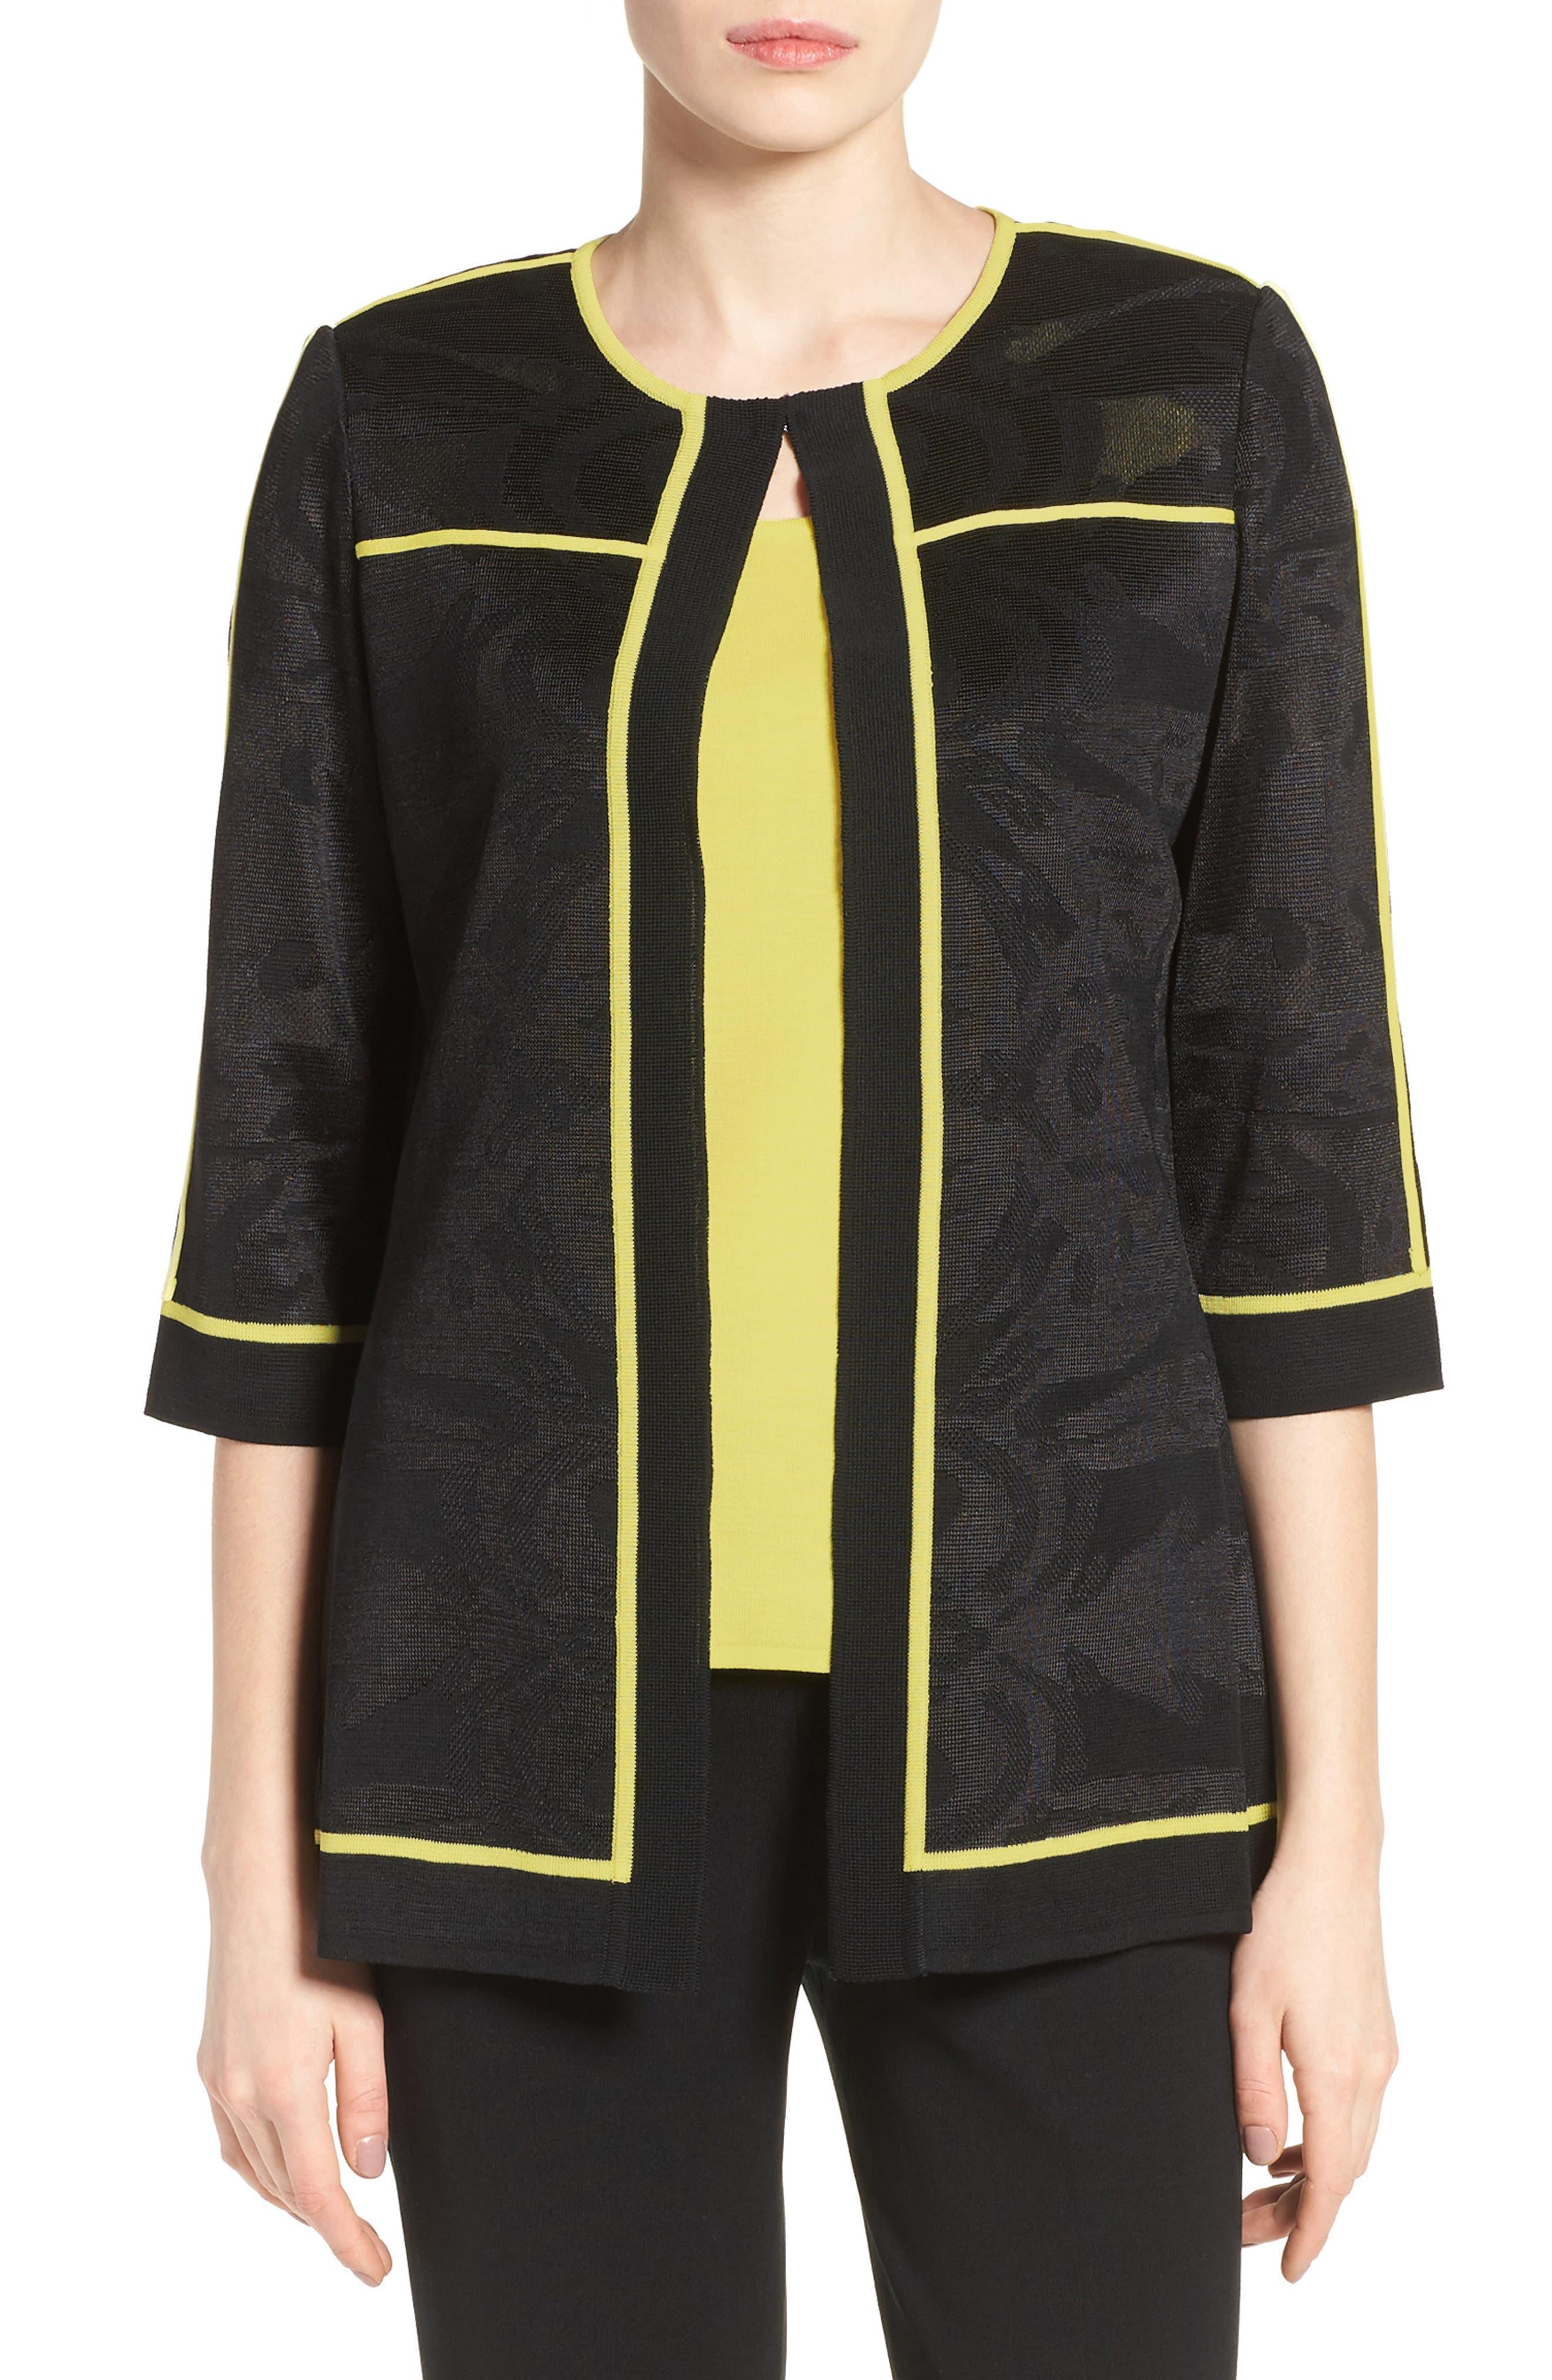 Ming Wang Contrast Piping Burnout Floral Knit Jacket